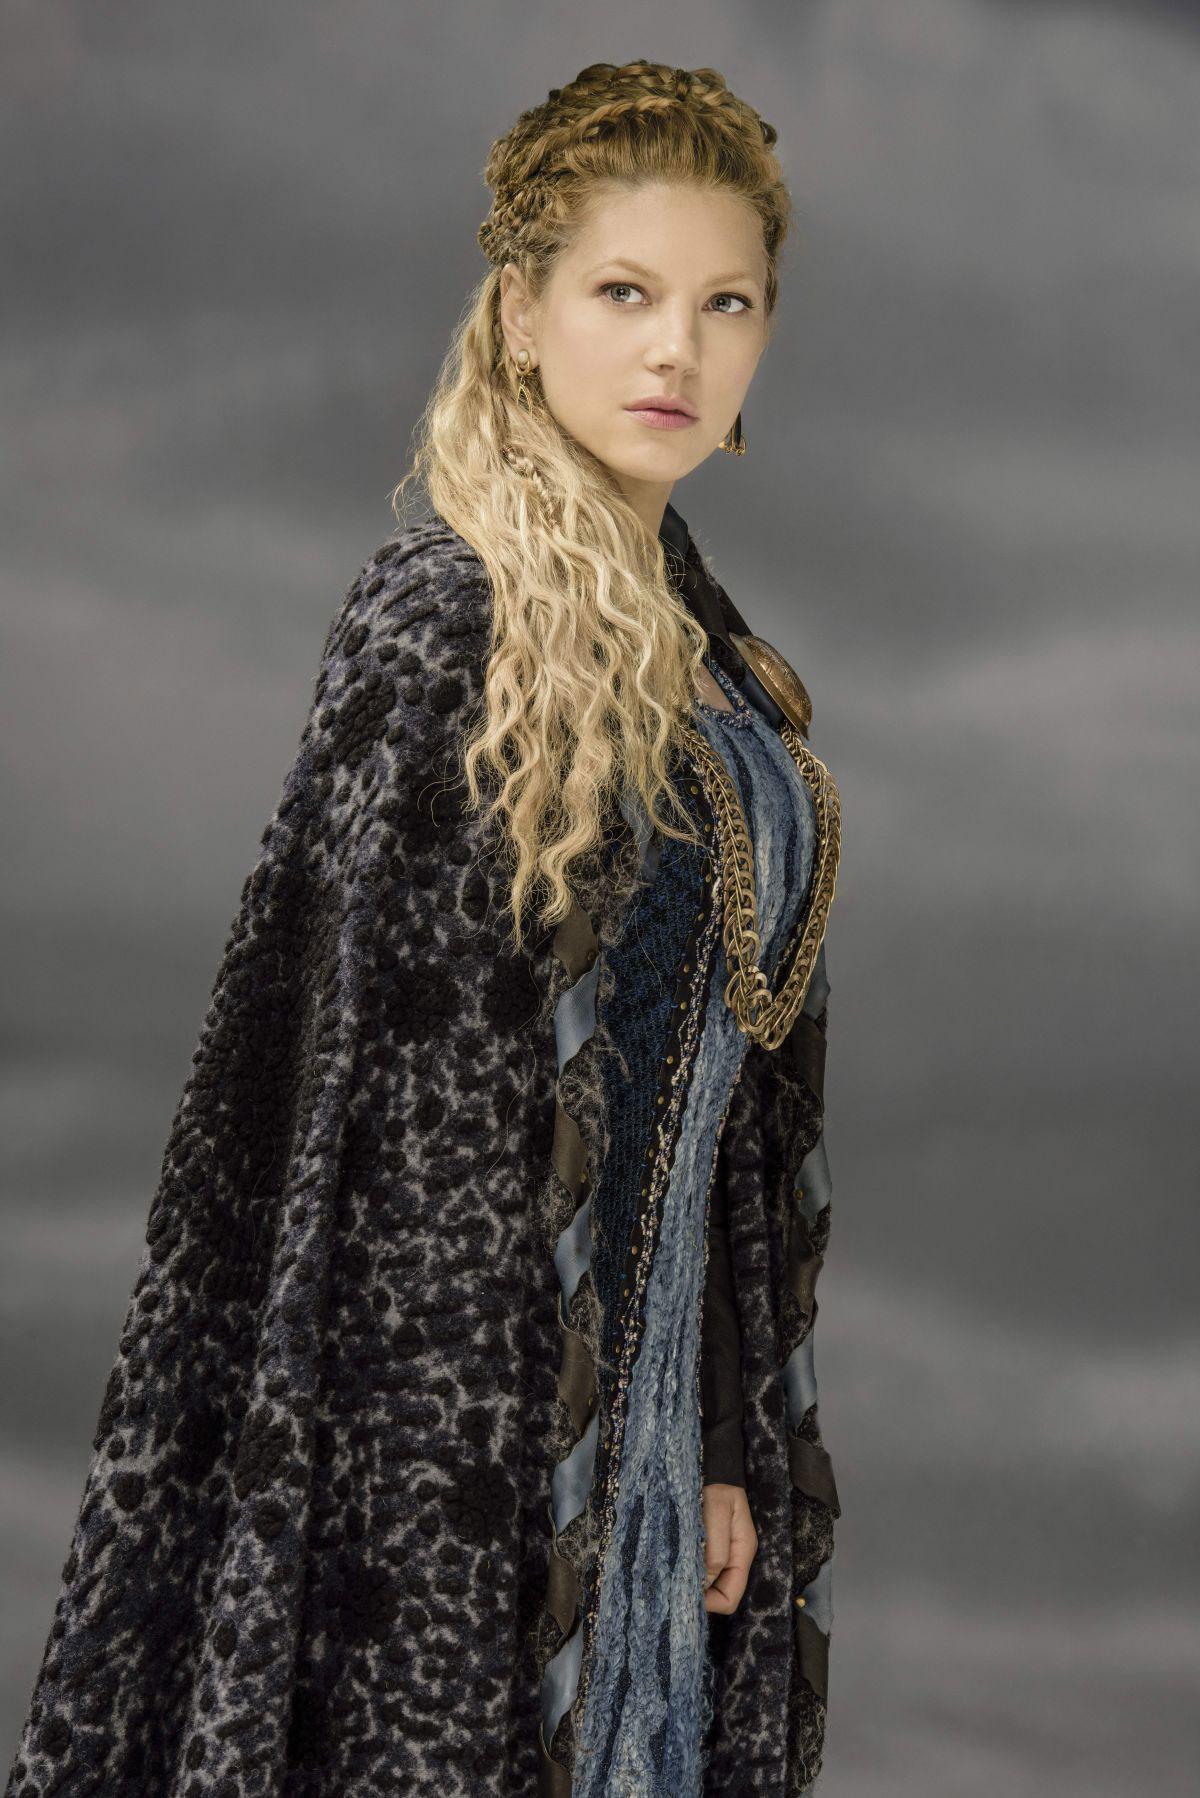 katheryn winnick � vikings season 3 promo photos justfabzz